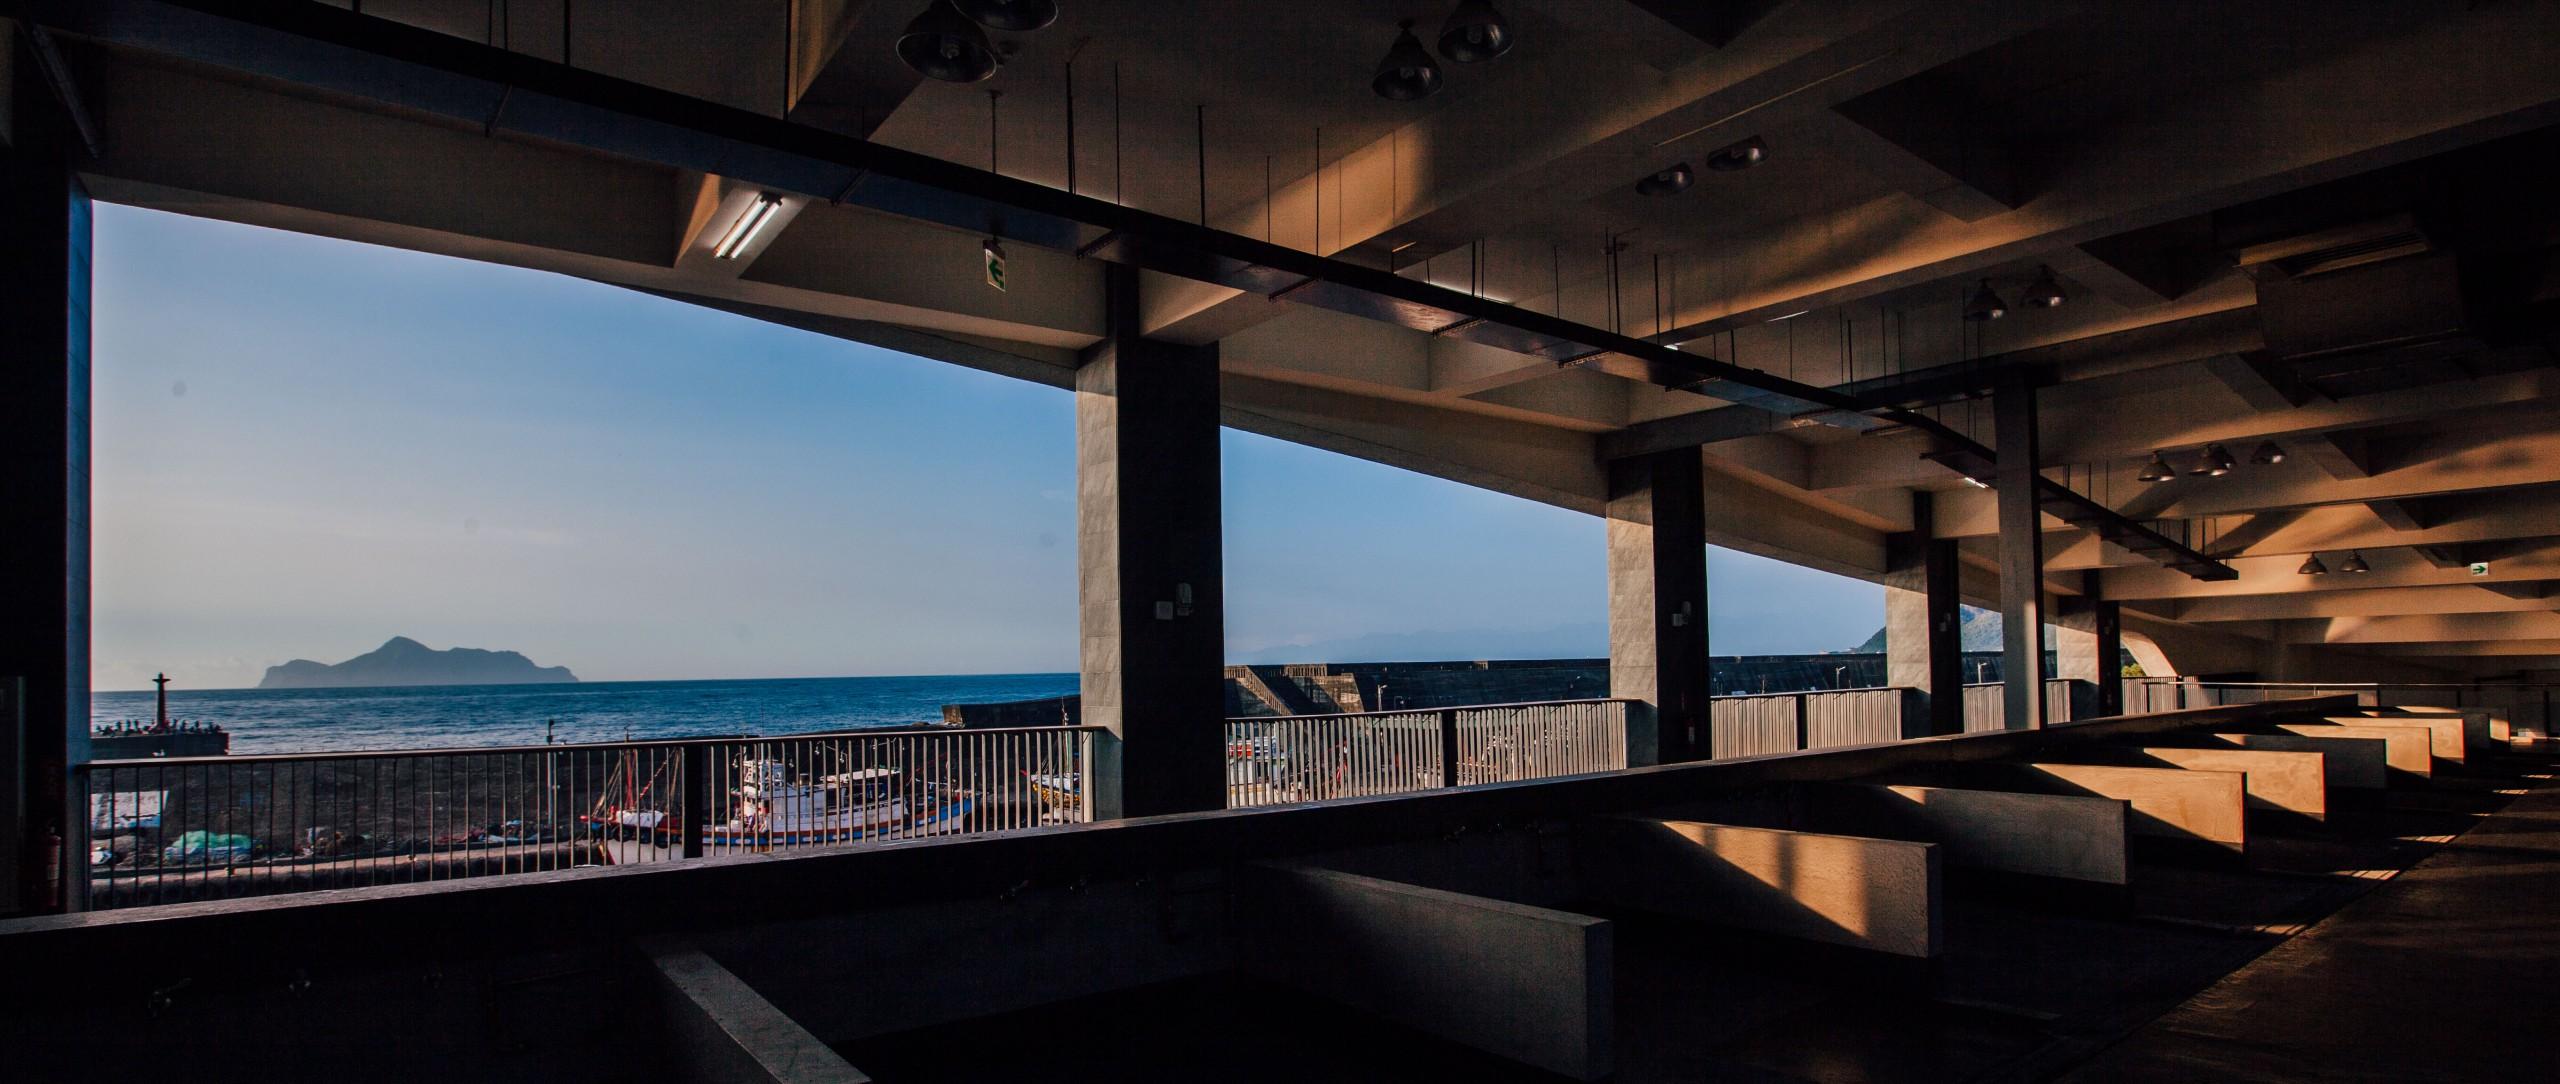 德築-DEZU-project-大溪漁港-architecture-Guishan-Island-1